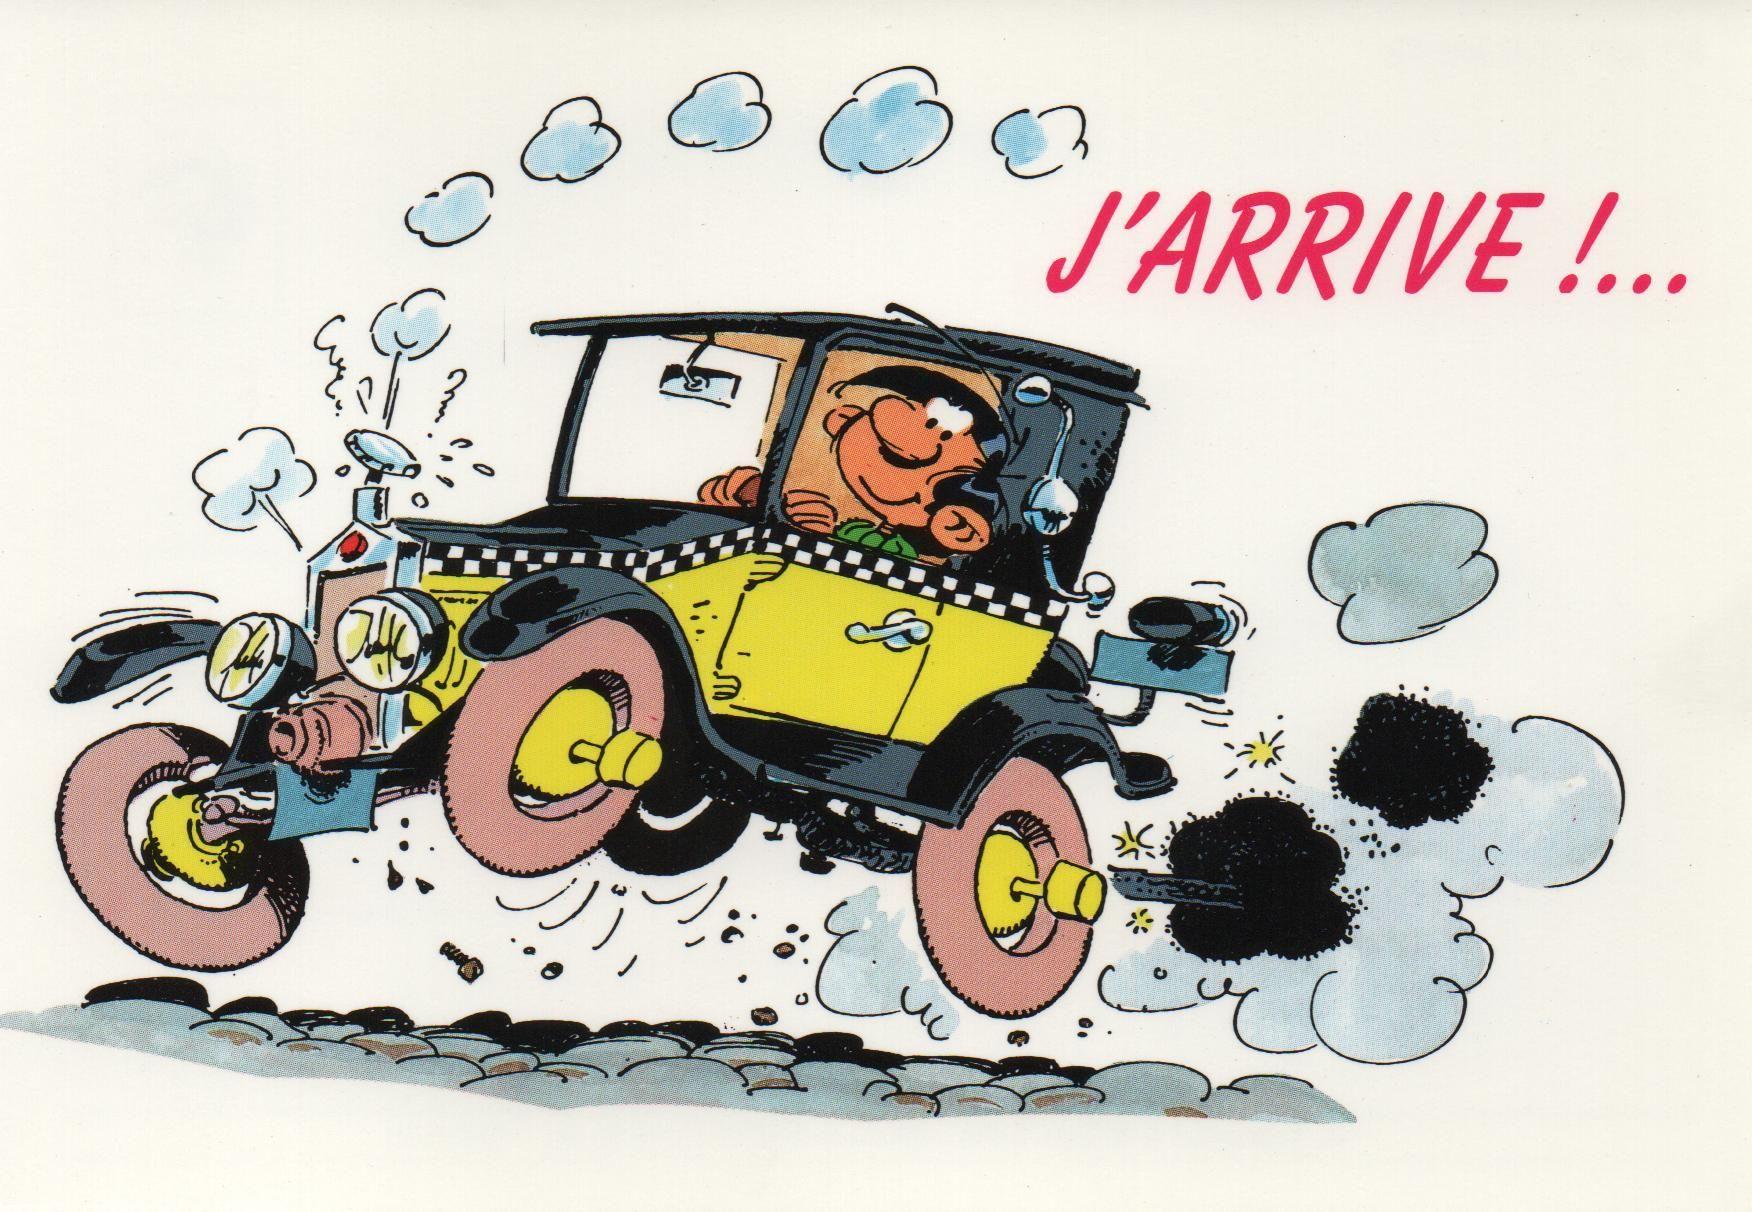 Guust flater postkaart j 39 arrive nr 407 lagaffe - Dessin humoristique voiture ...